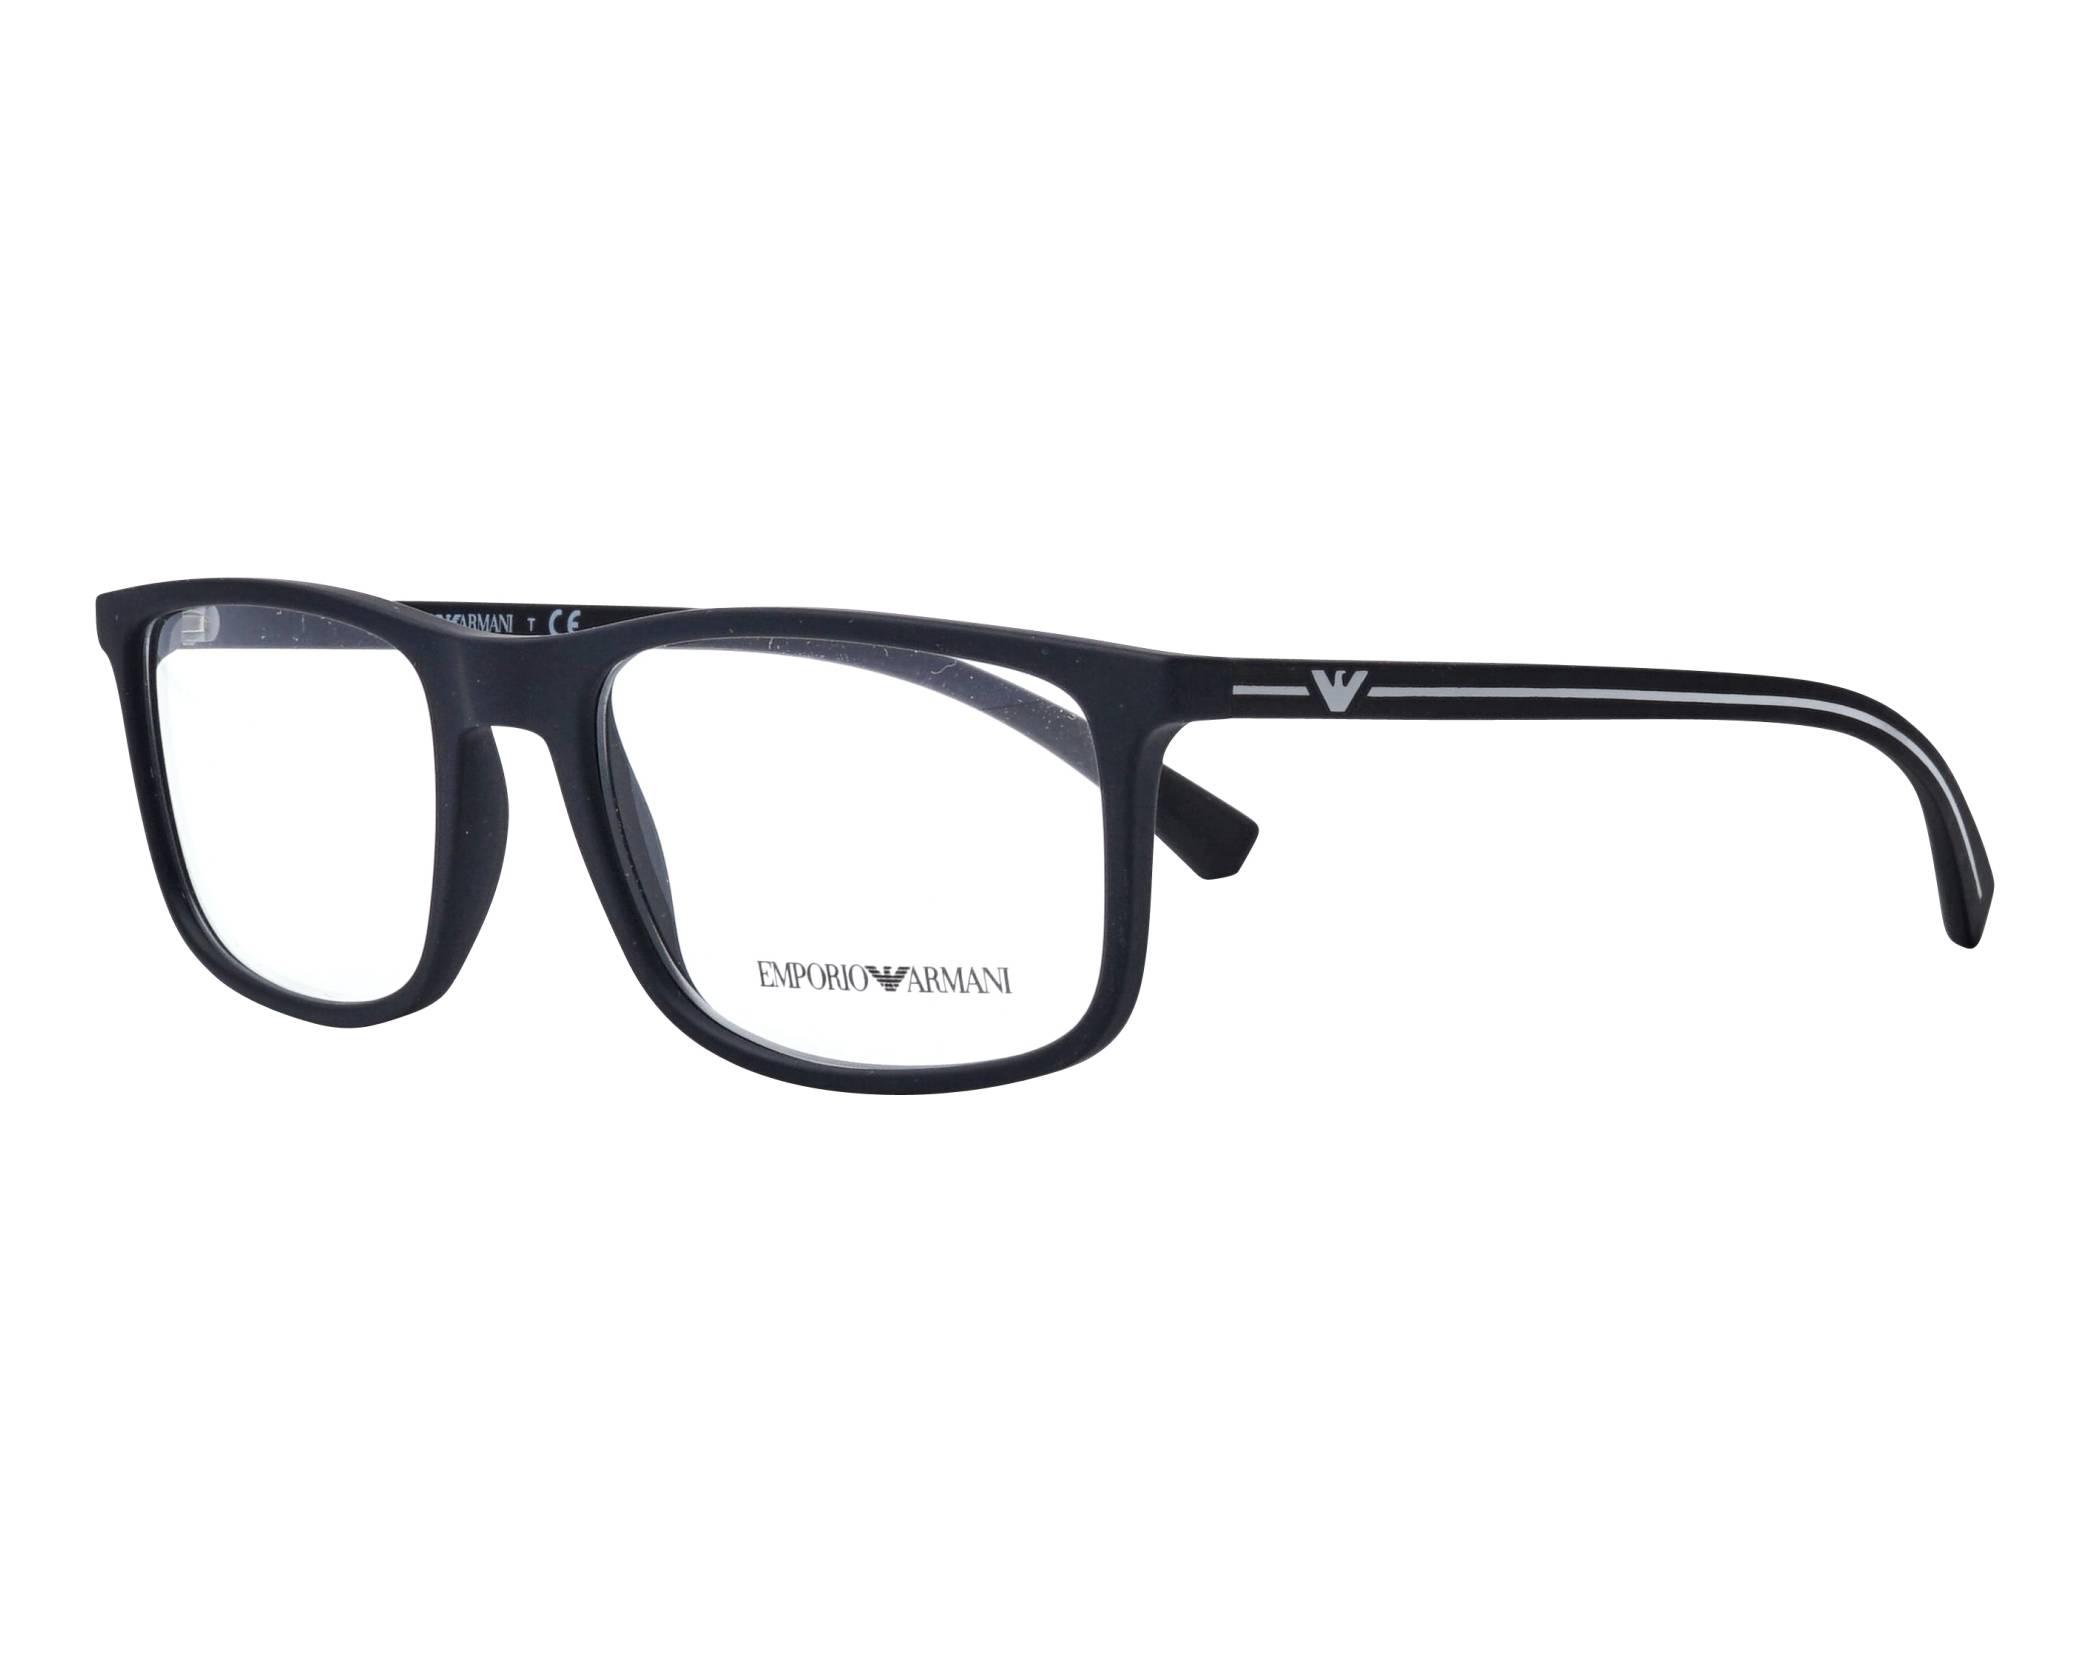 6104d39120 Gafas Graduadas Emporio Armani EA-3135 5063 53-18 Negra Gun vista de perfil